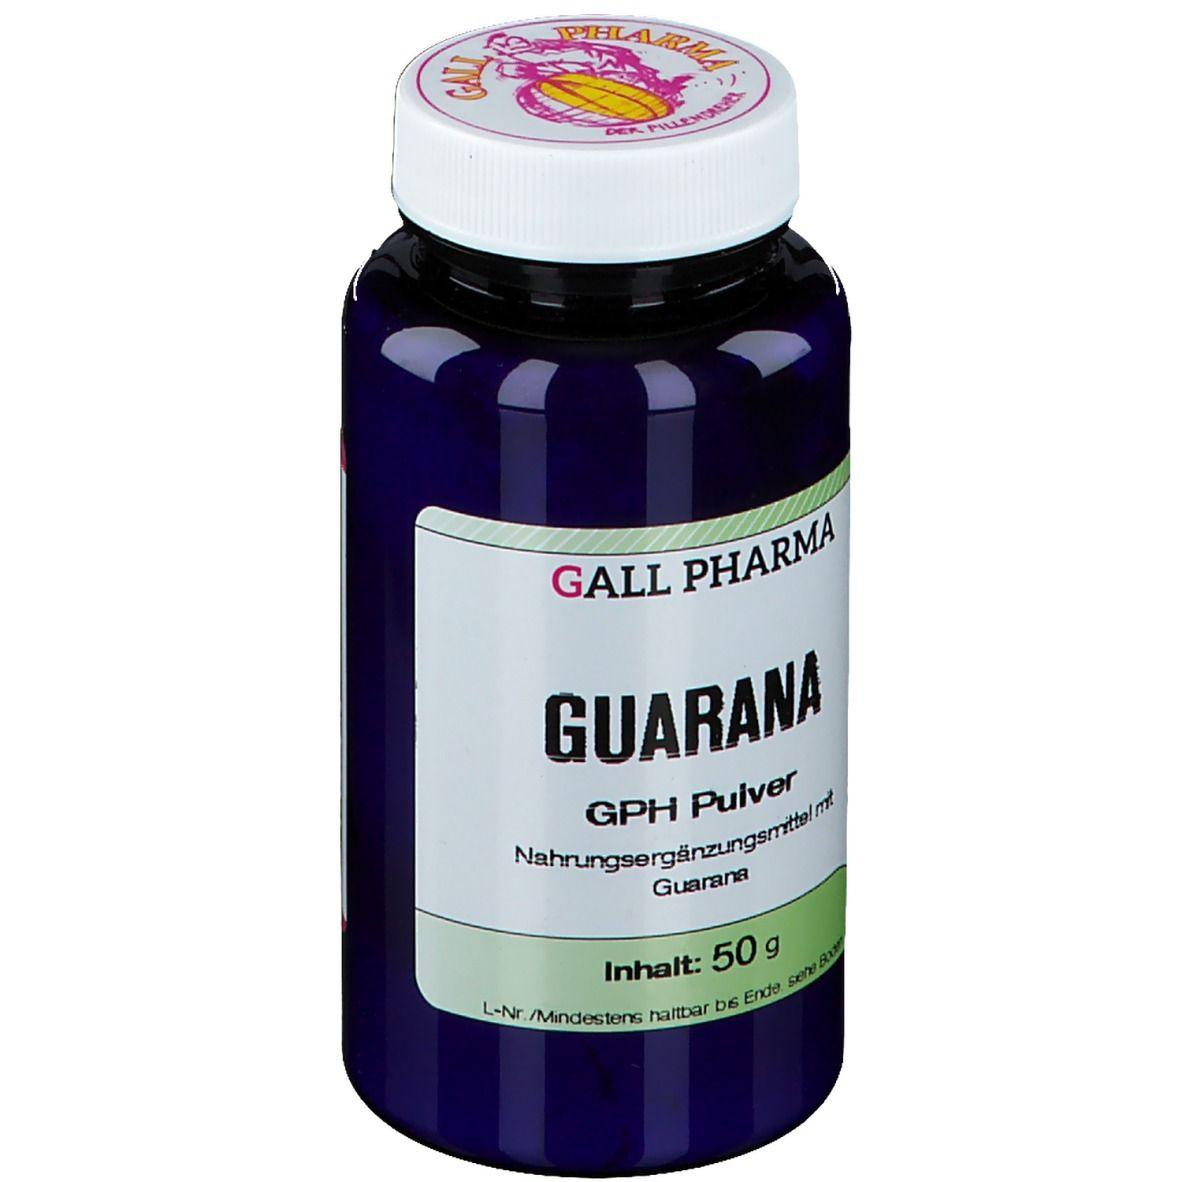 GALL PHARMA Guarana Pulver